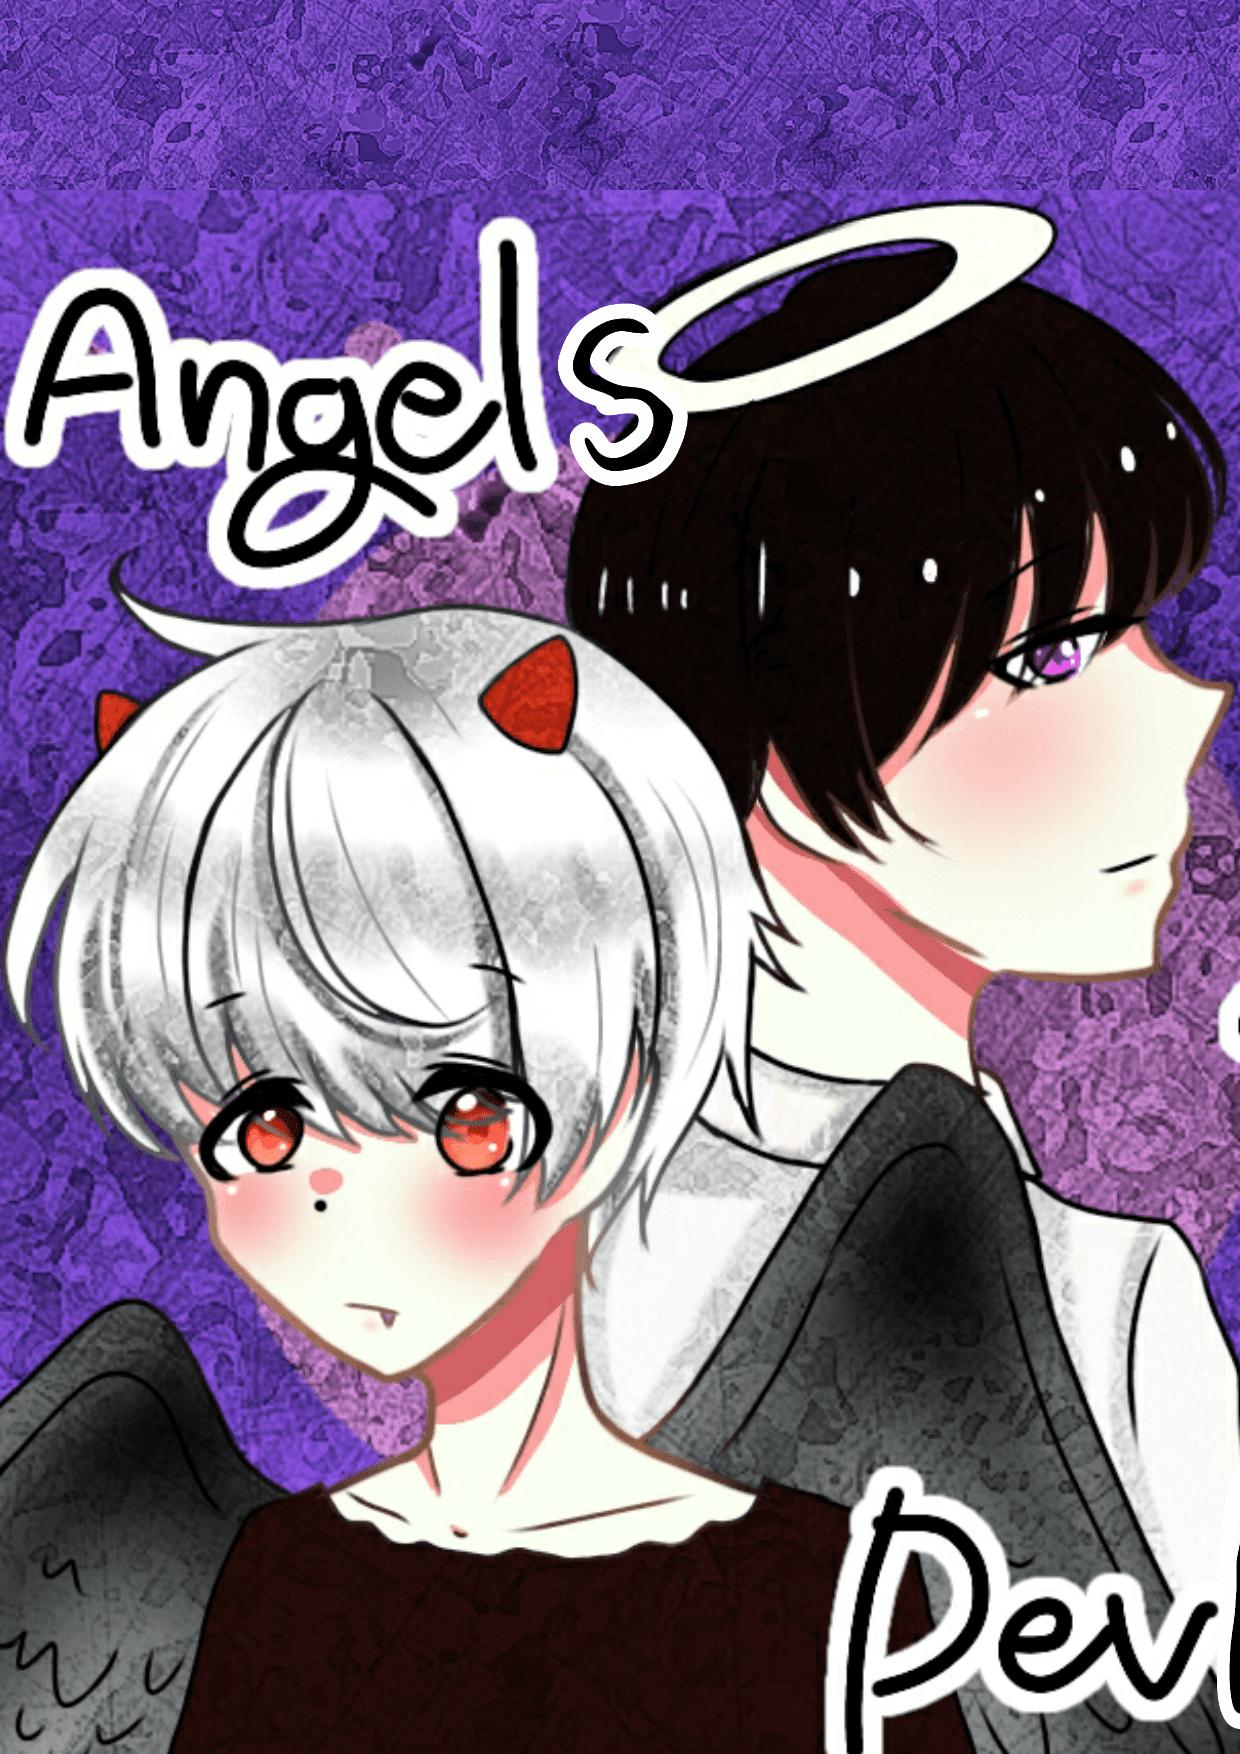 Angels and devil นางฟ้ากับปีศาจ